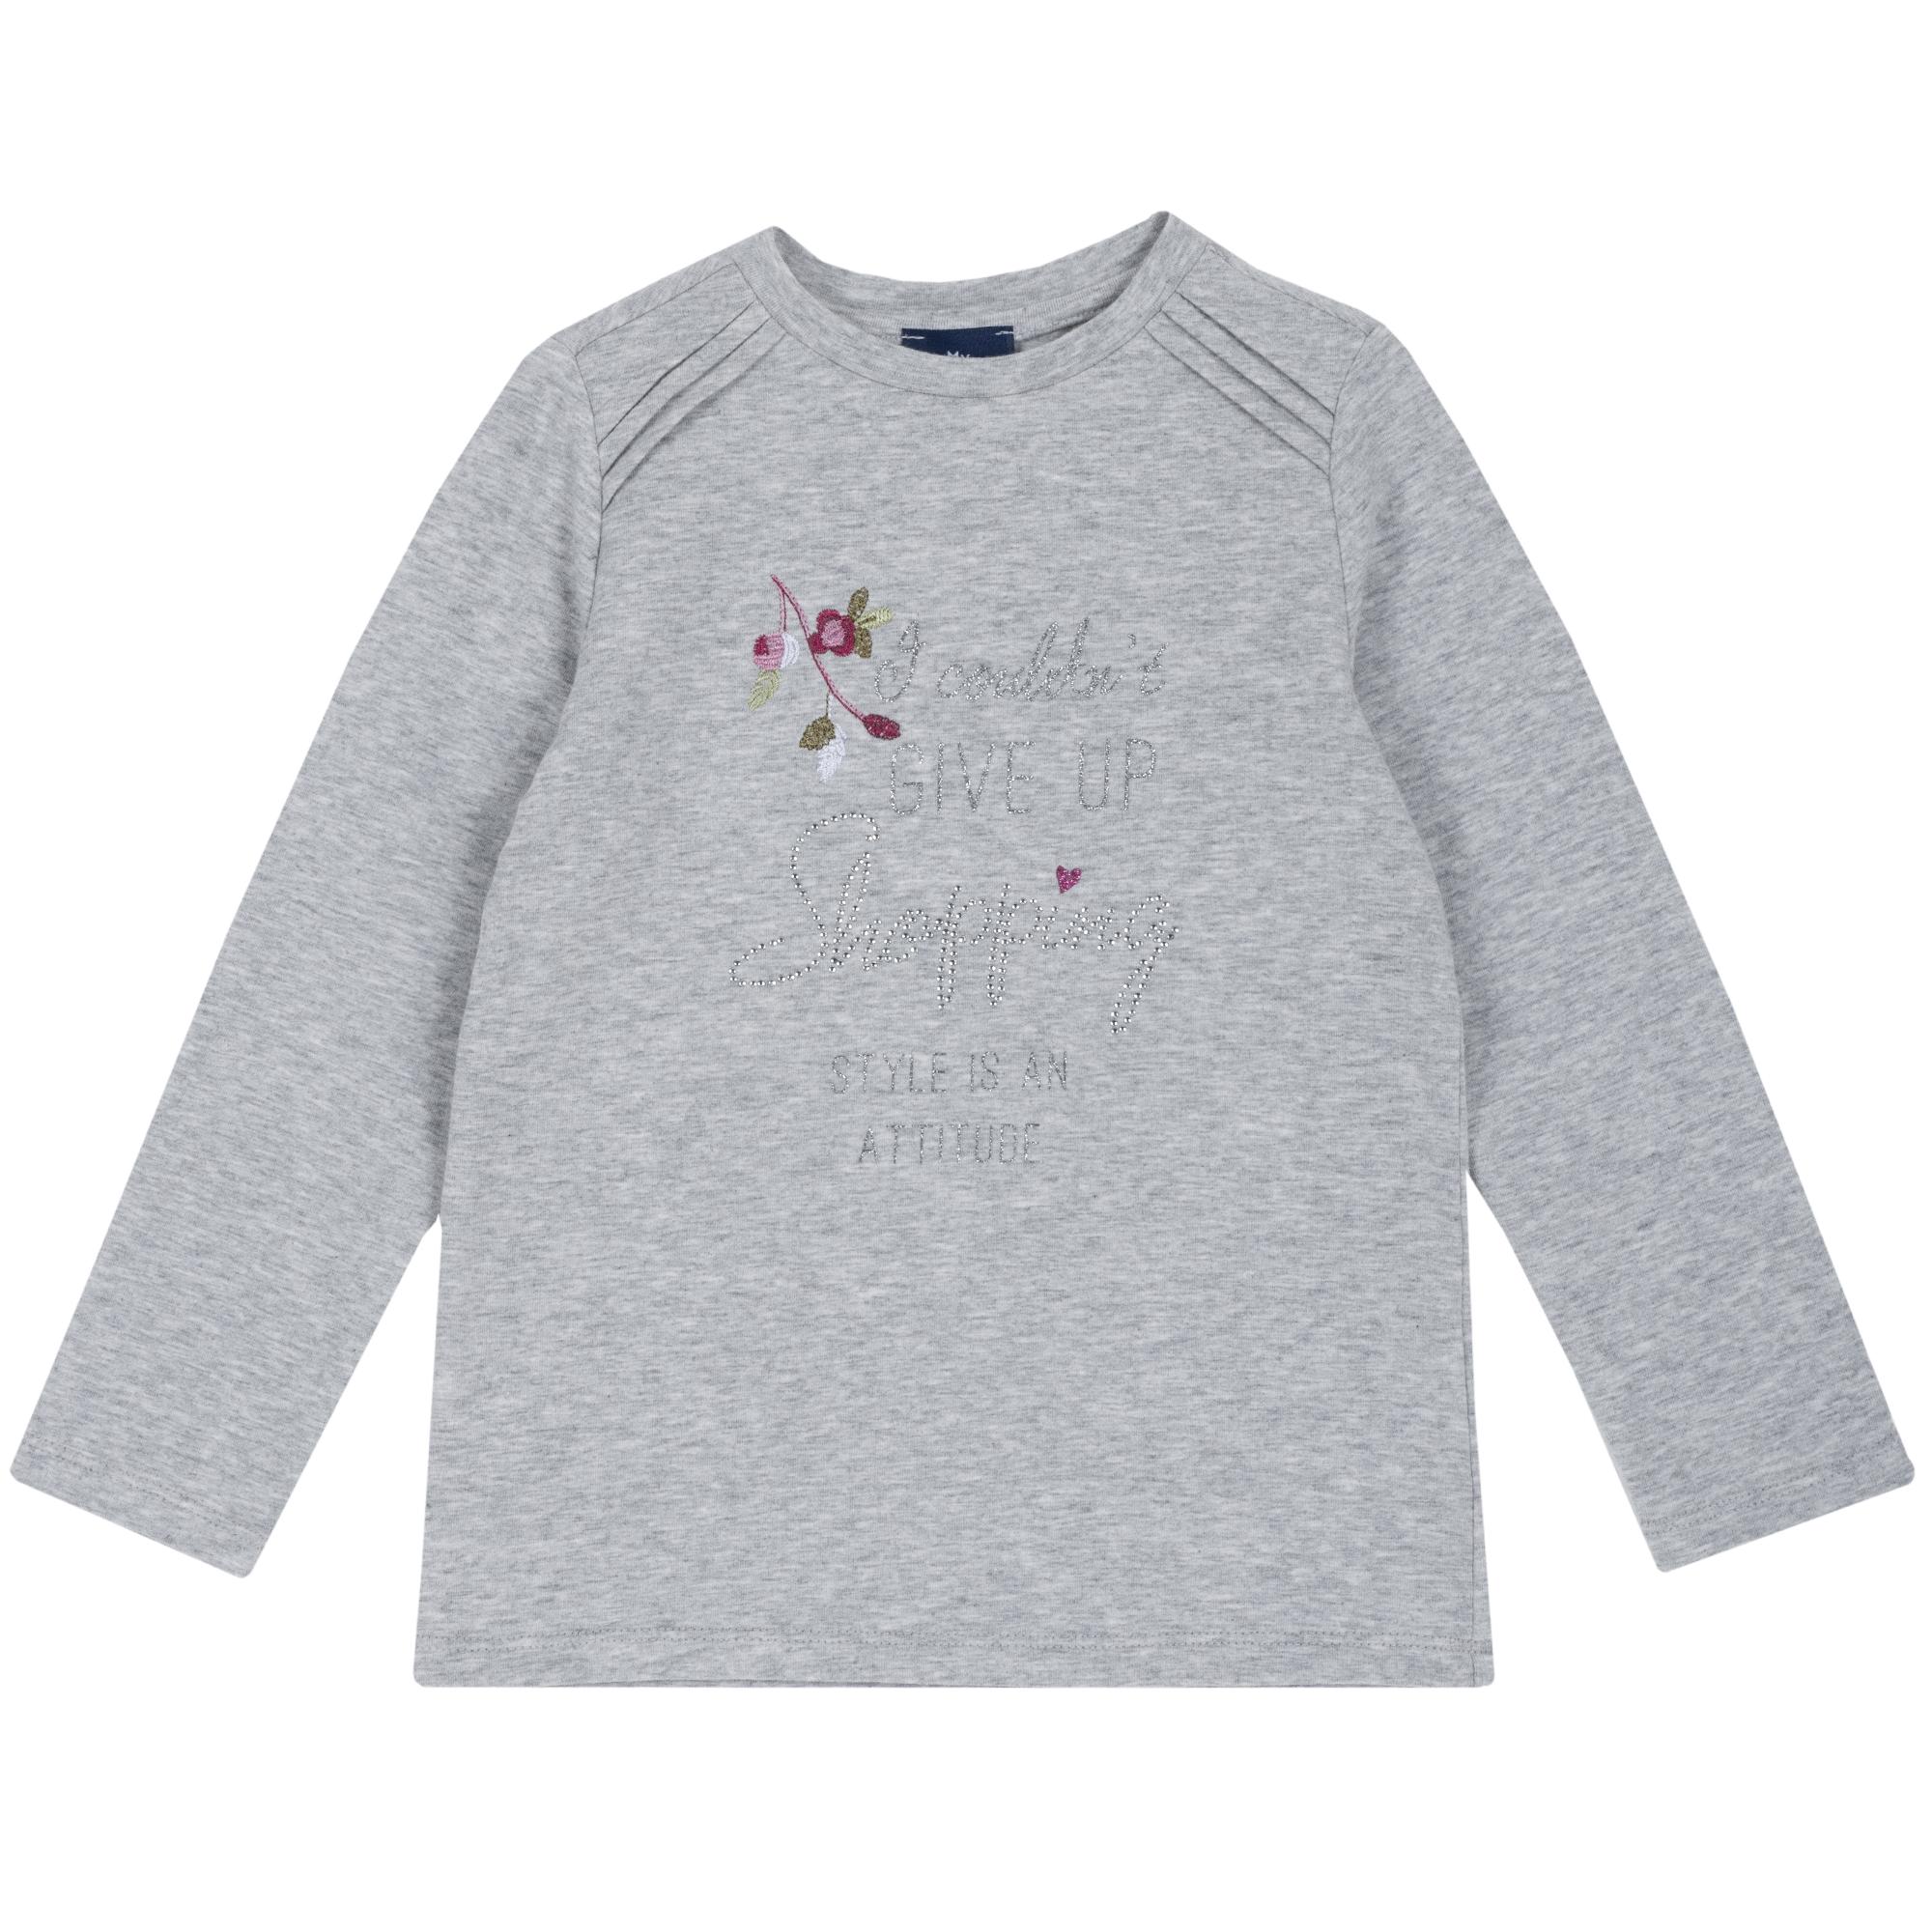 Tricou copii Chicco, gri, 06527